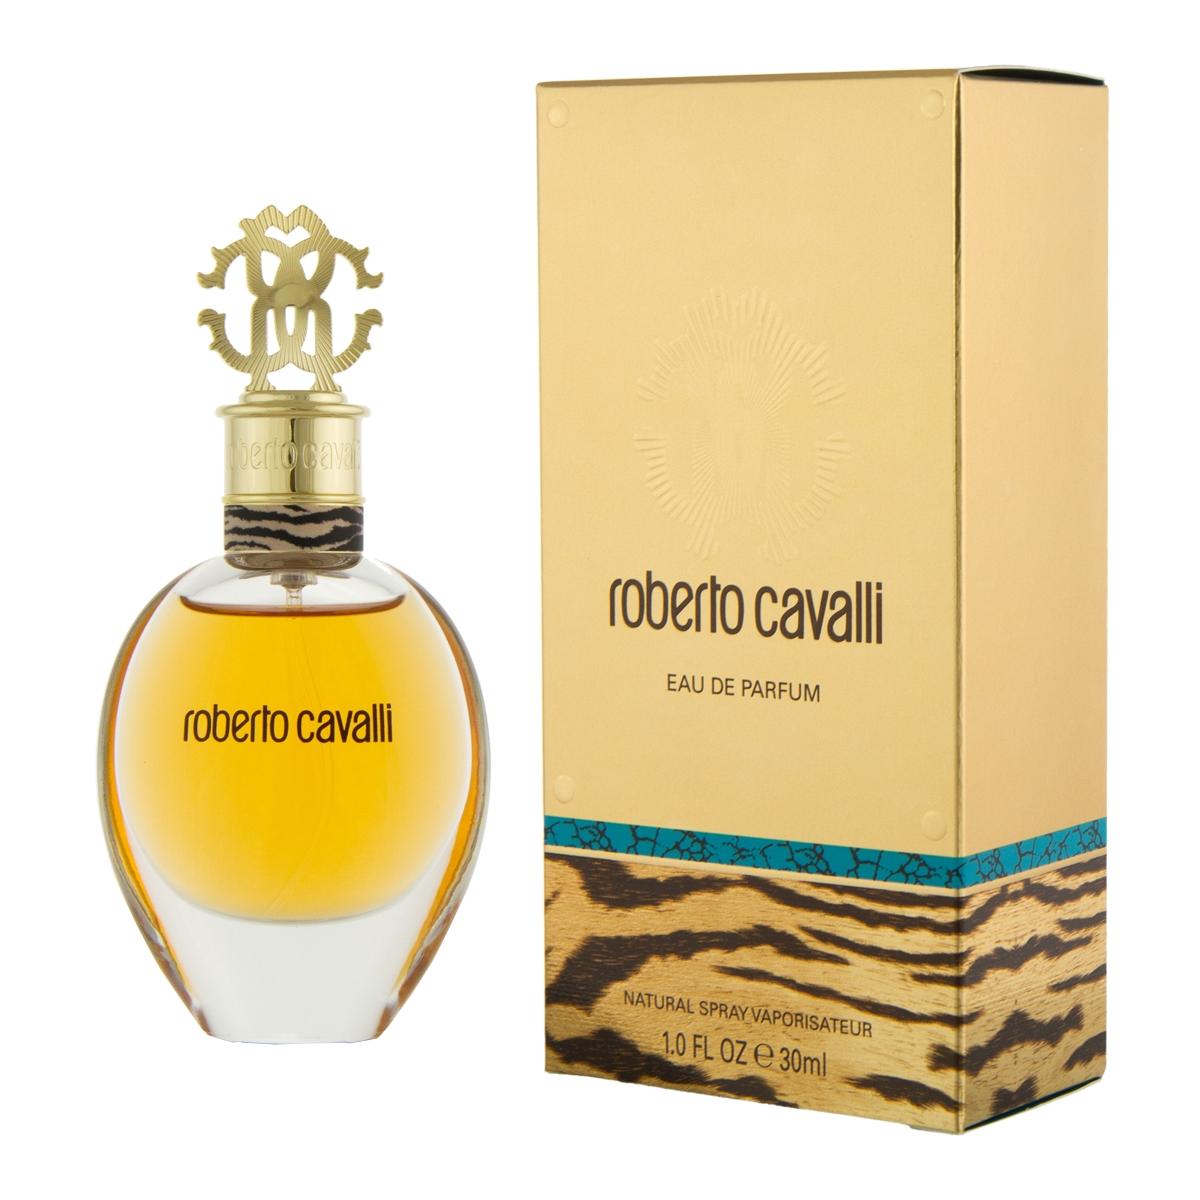 Roberto Cavalli Roberto Cavalli Eau de Parfum EDP 30 ml W